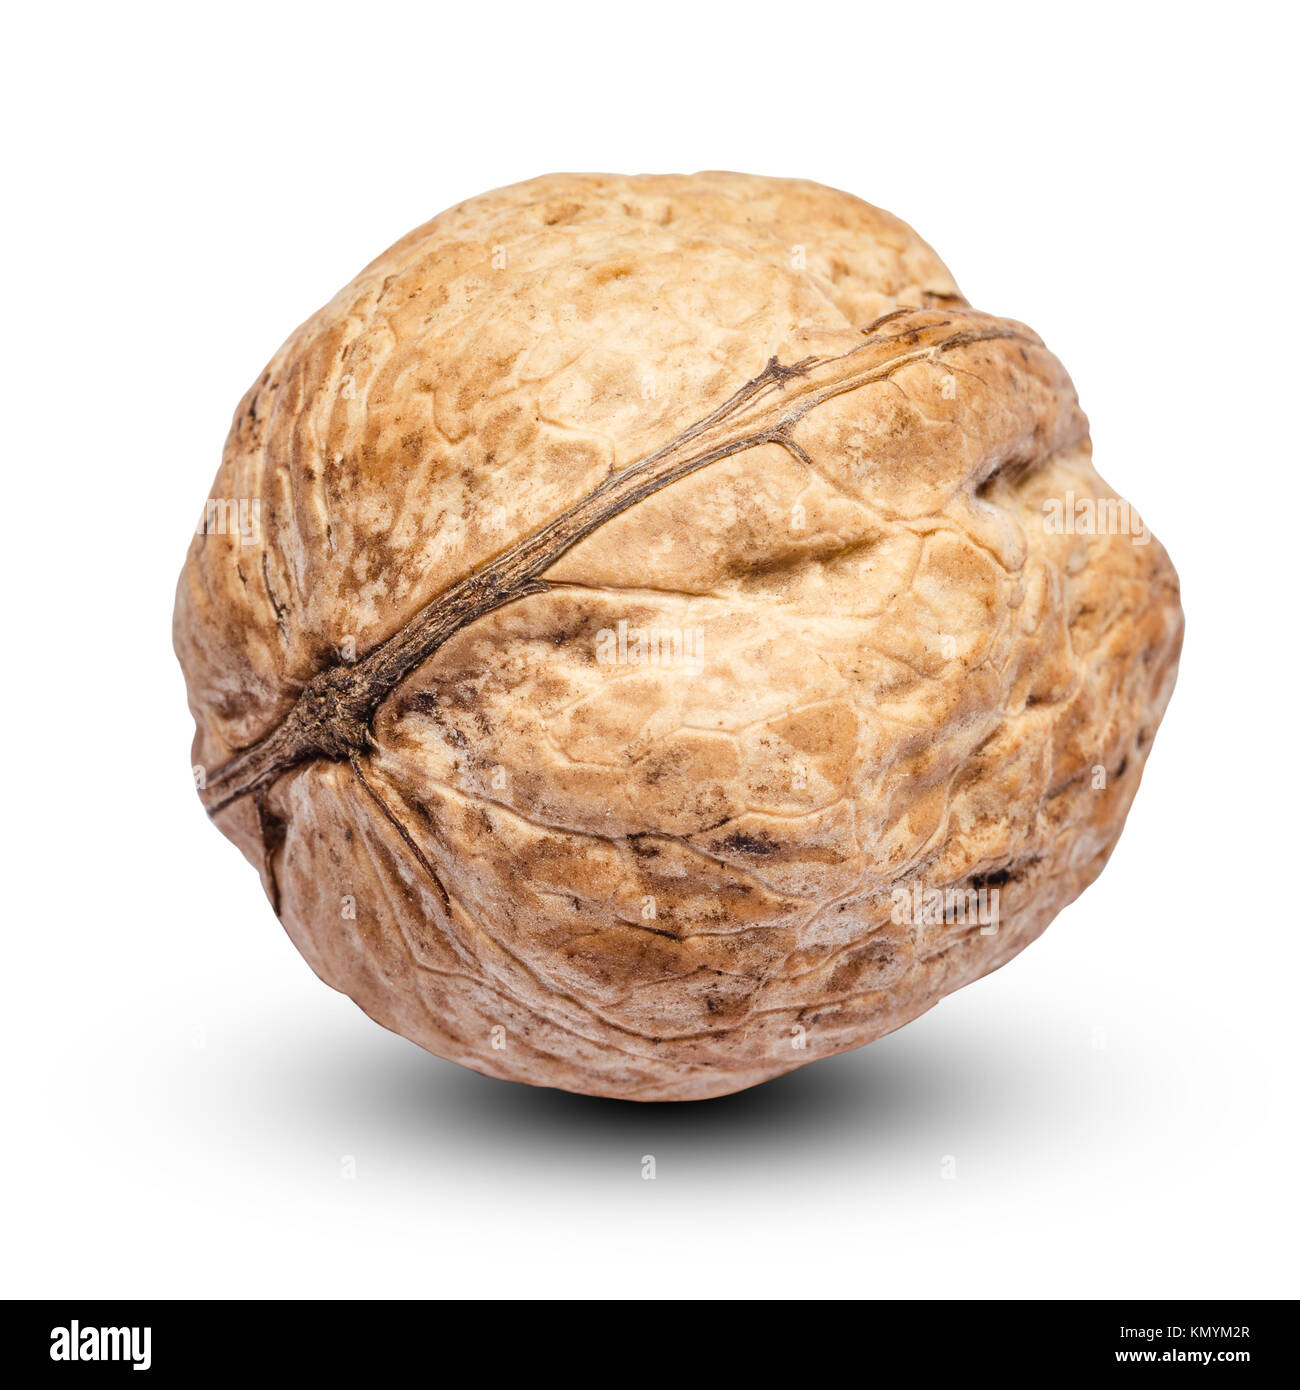 whole walnut isolated on white background. clipping path - Stock Image